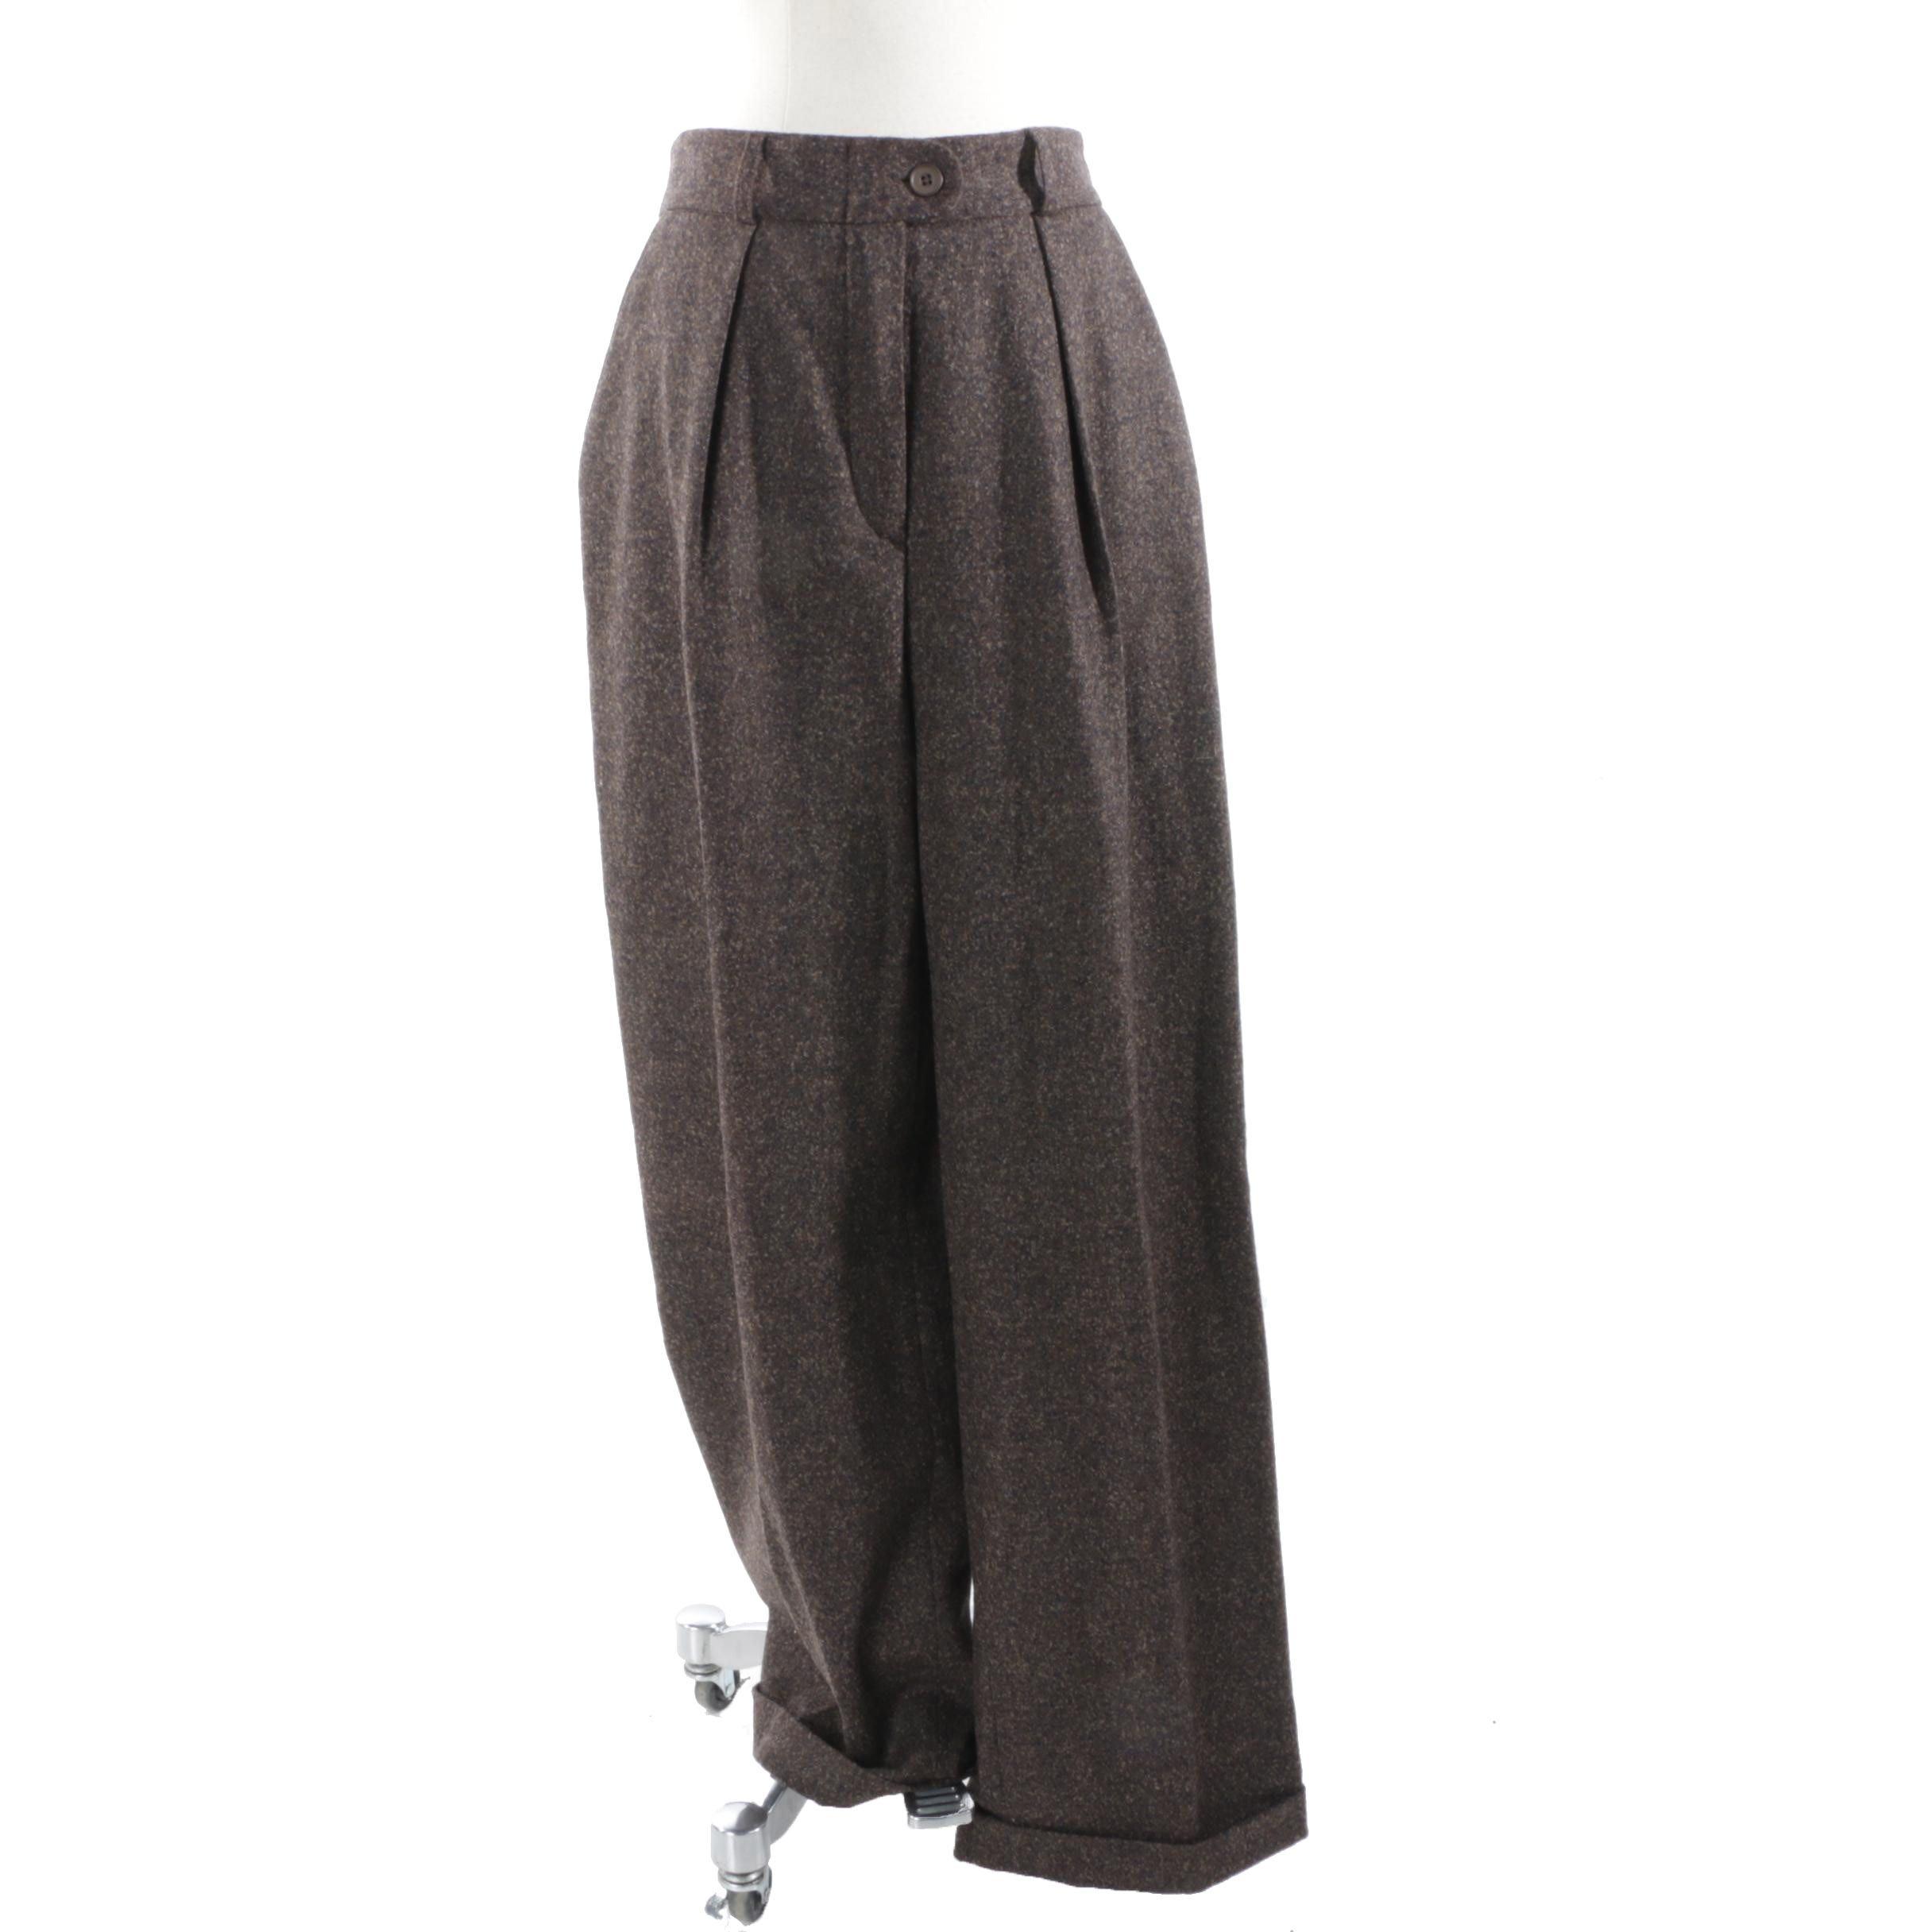 Alberta Ferretti Wool Cashmere Wide Leg Pleated Trousers